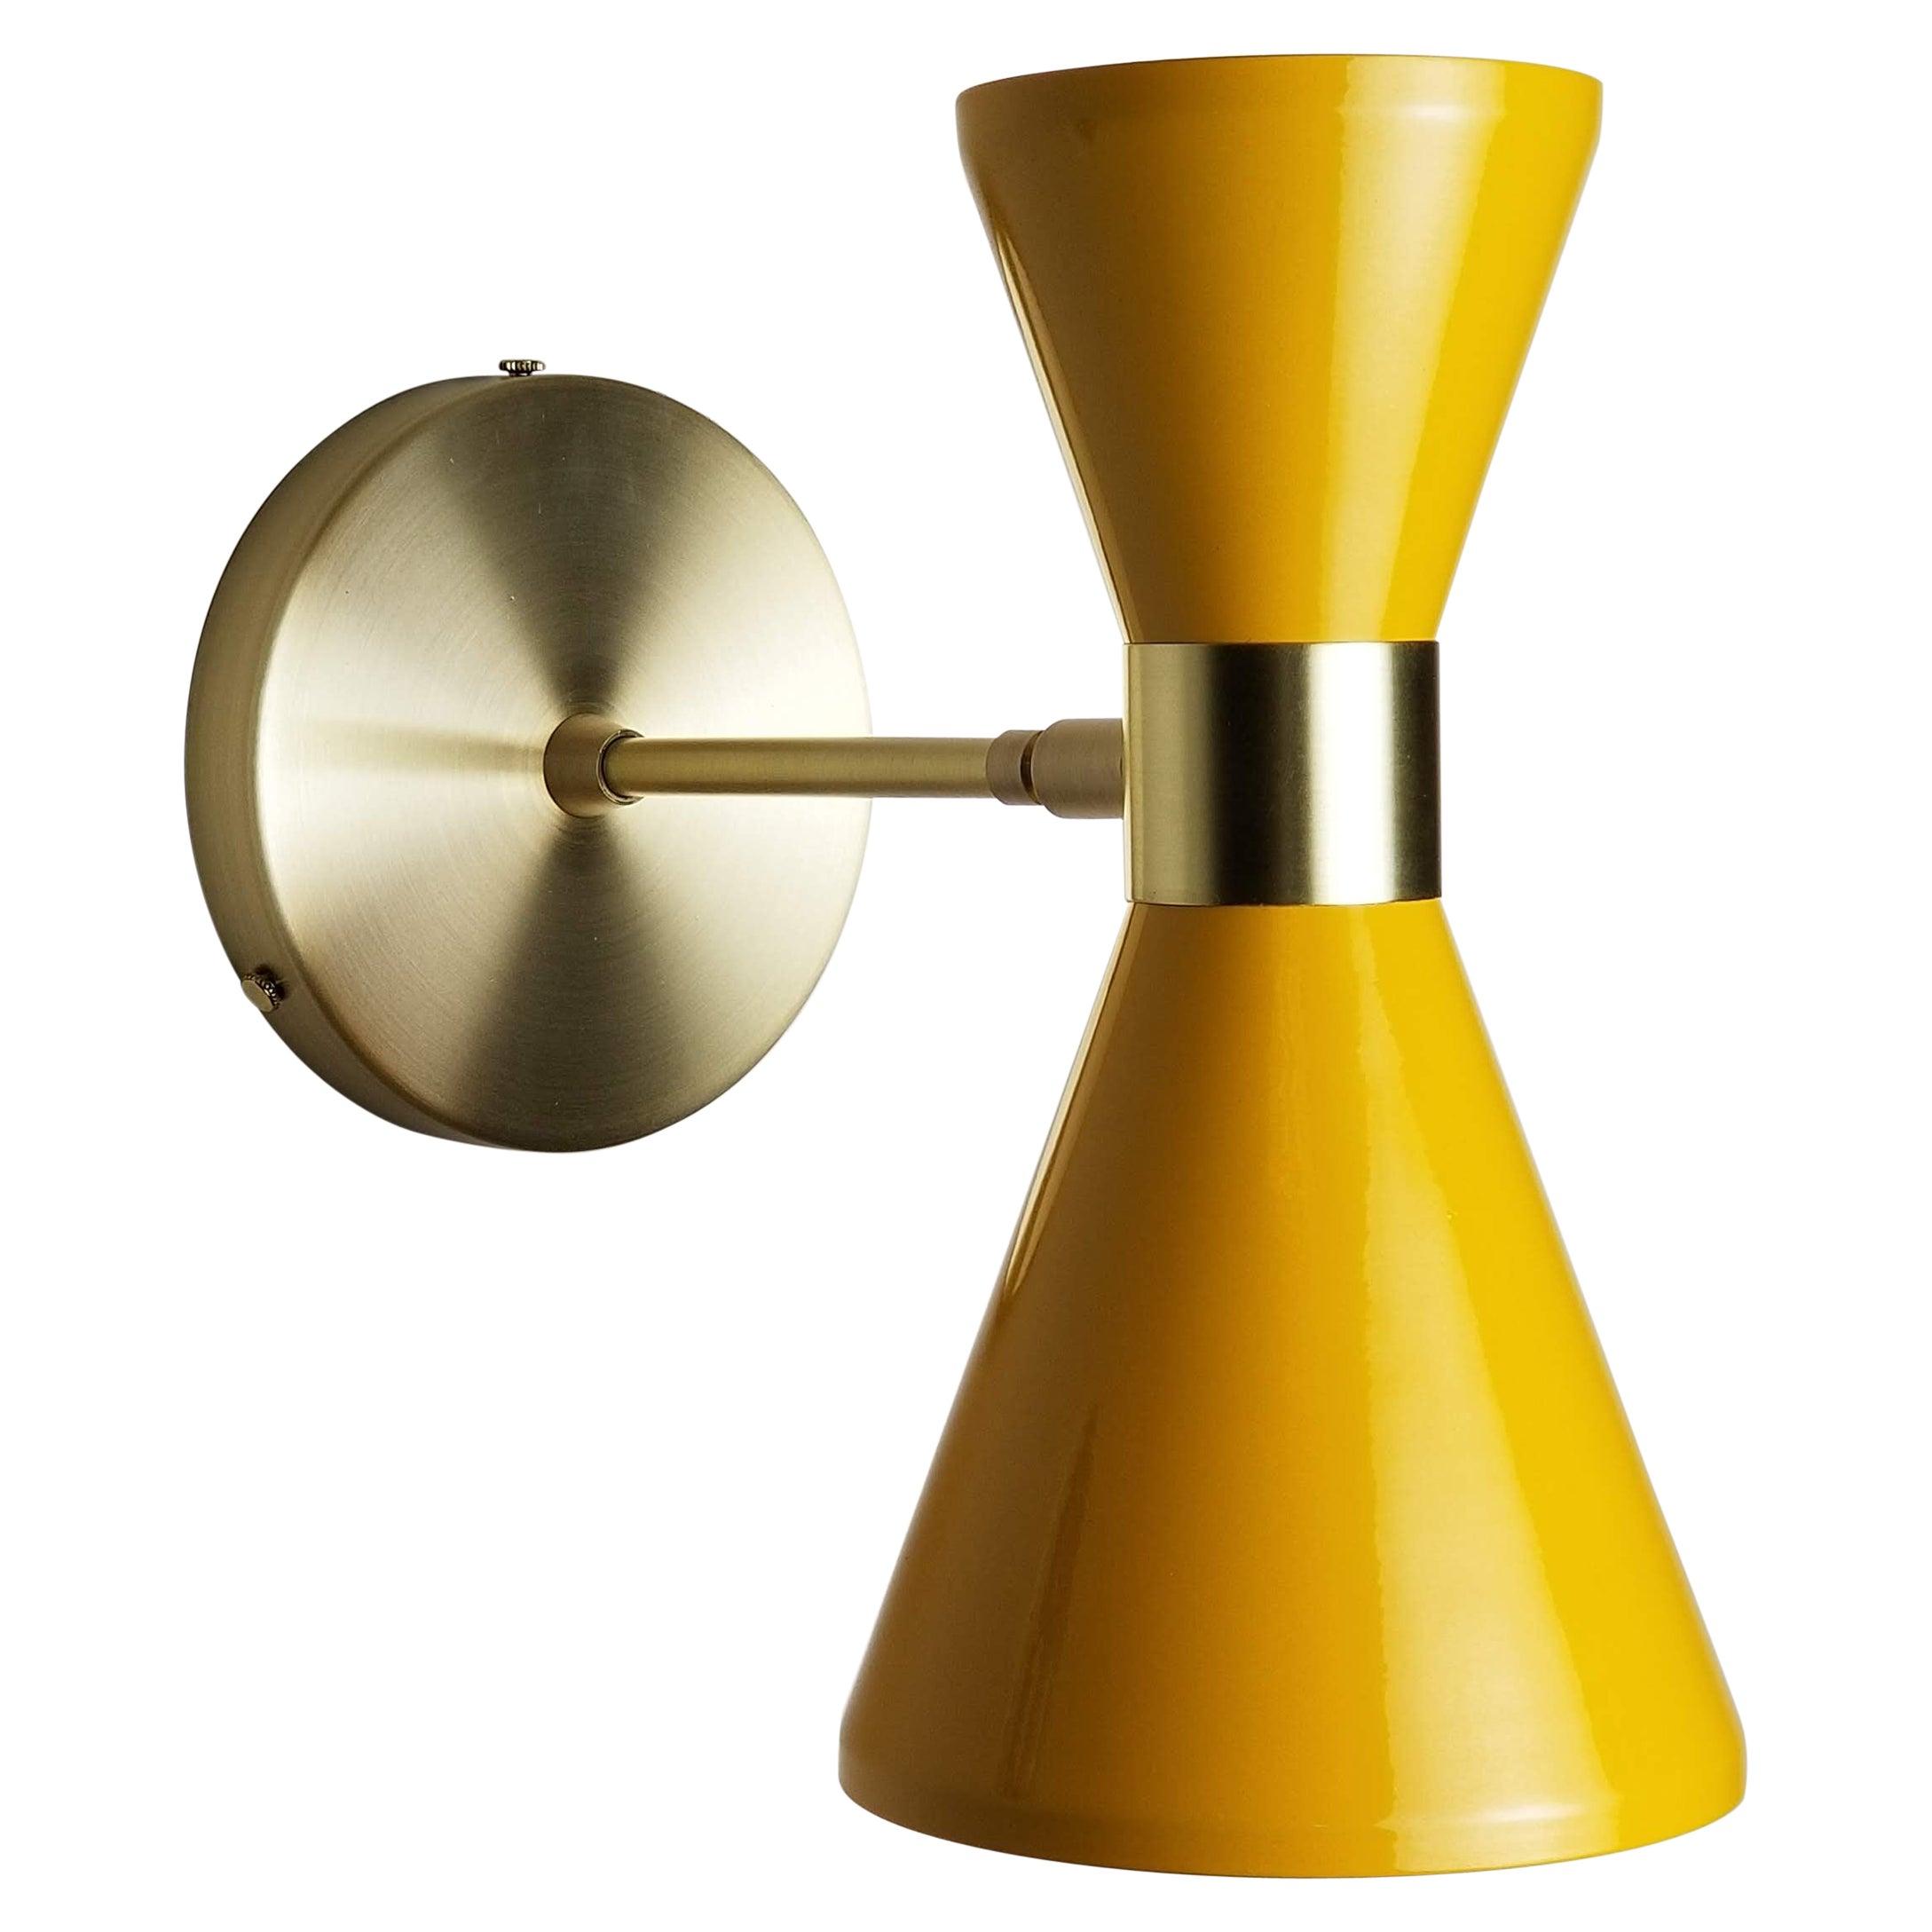 Modern Campana Wall Sconce in Brass + Yellow Enamel by Blueprint Lighting